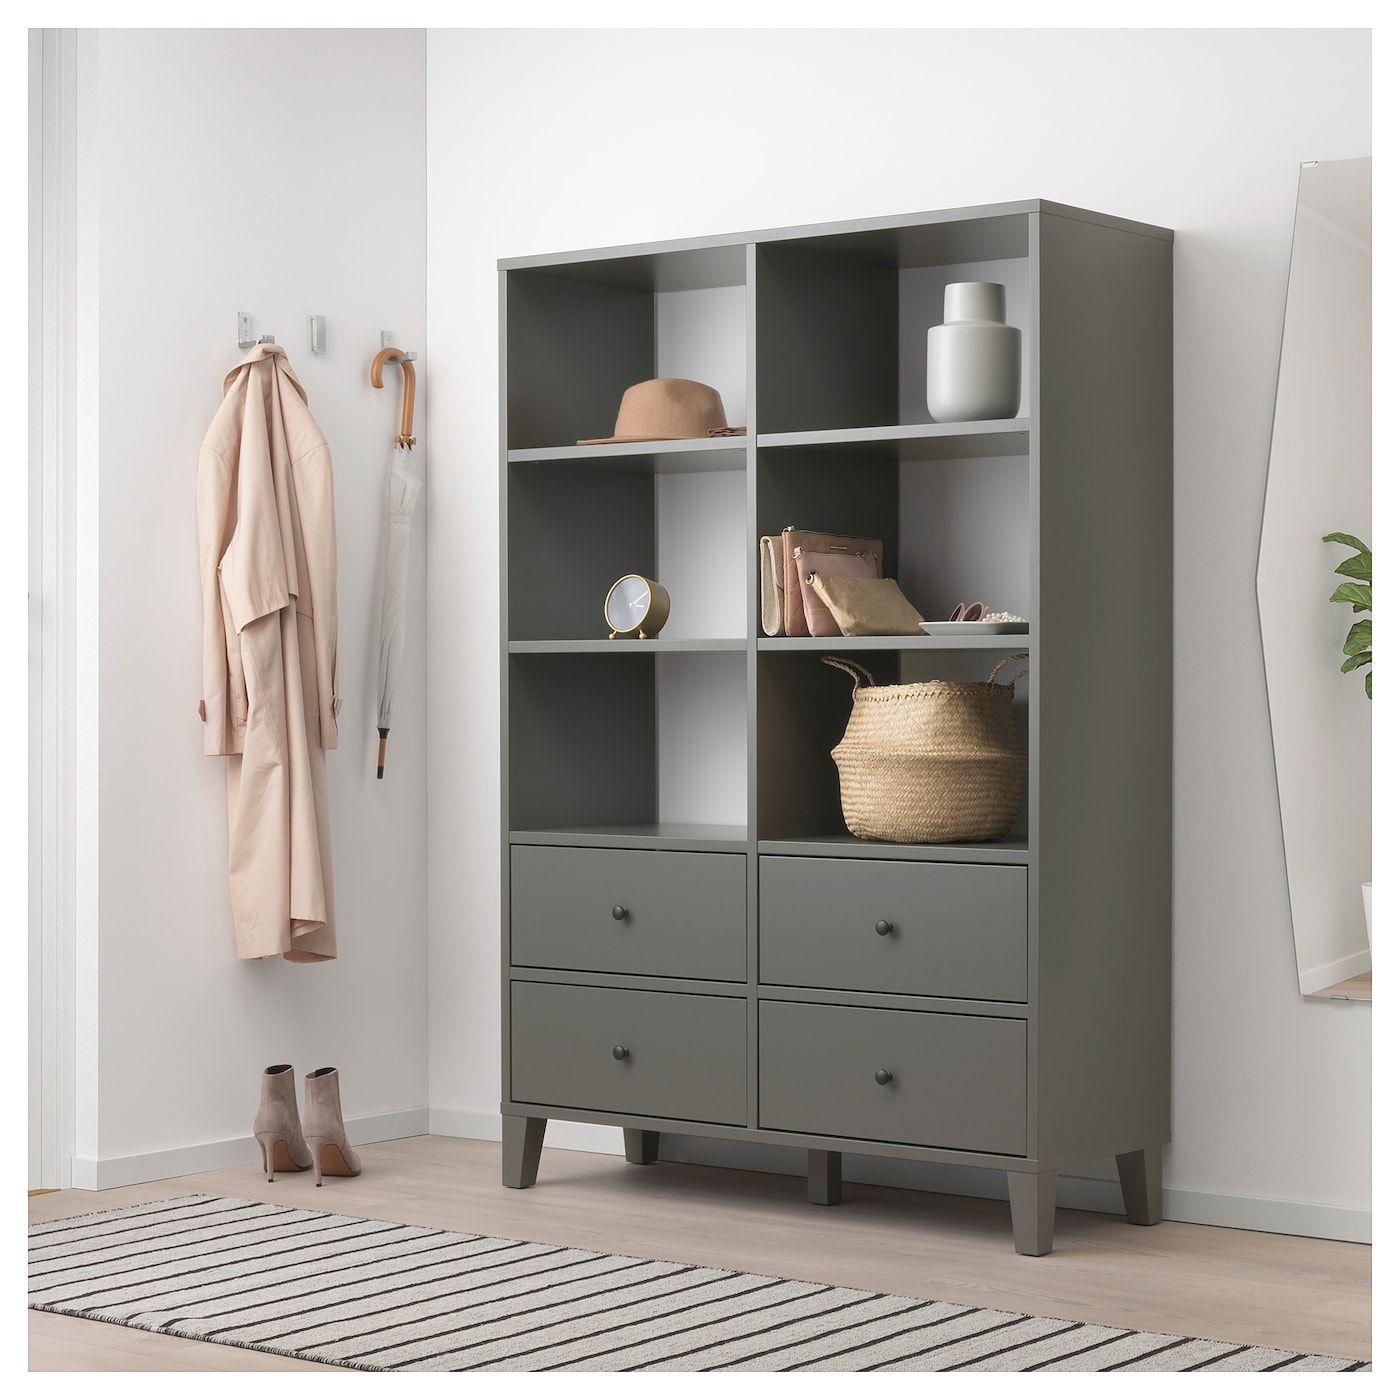 "Storage unit, dark gray, 47 1/4x68 1/8 "" Bedroom storage"